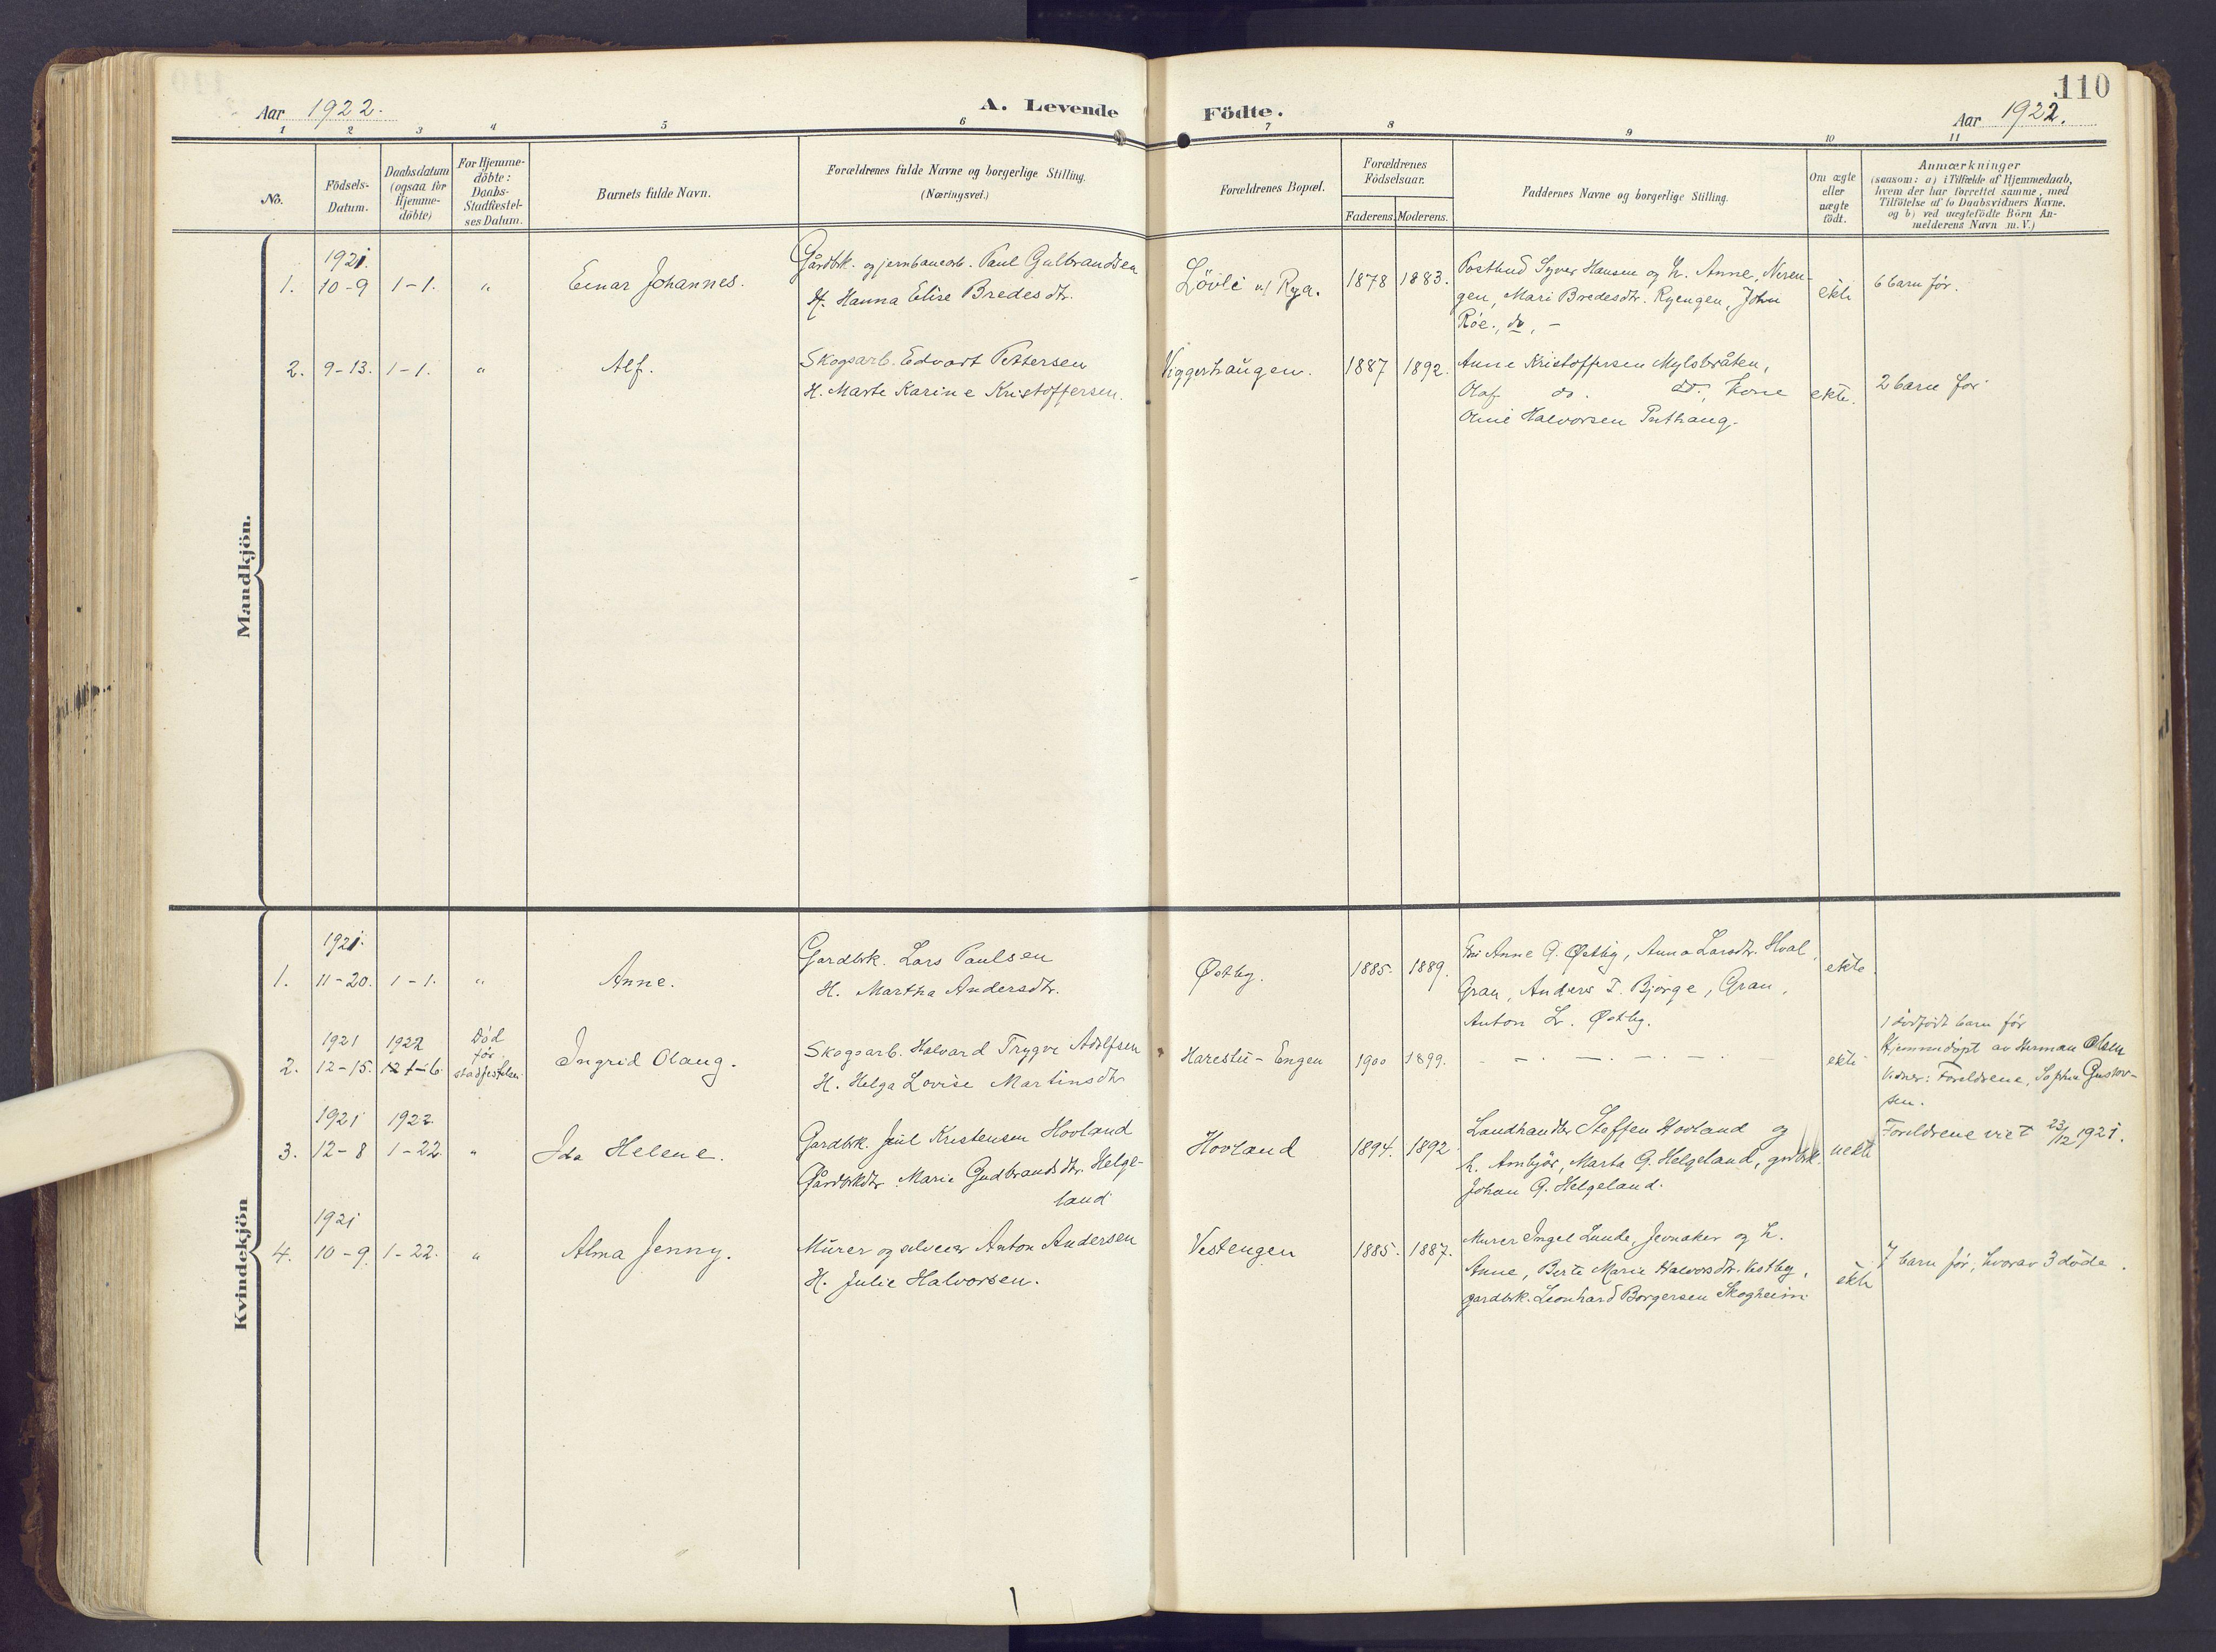 SAH, Lunner prestekontor, H/Ha/Haa/L0001: Ministerialbok nr. 1, 1907-1922, s. 110